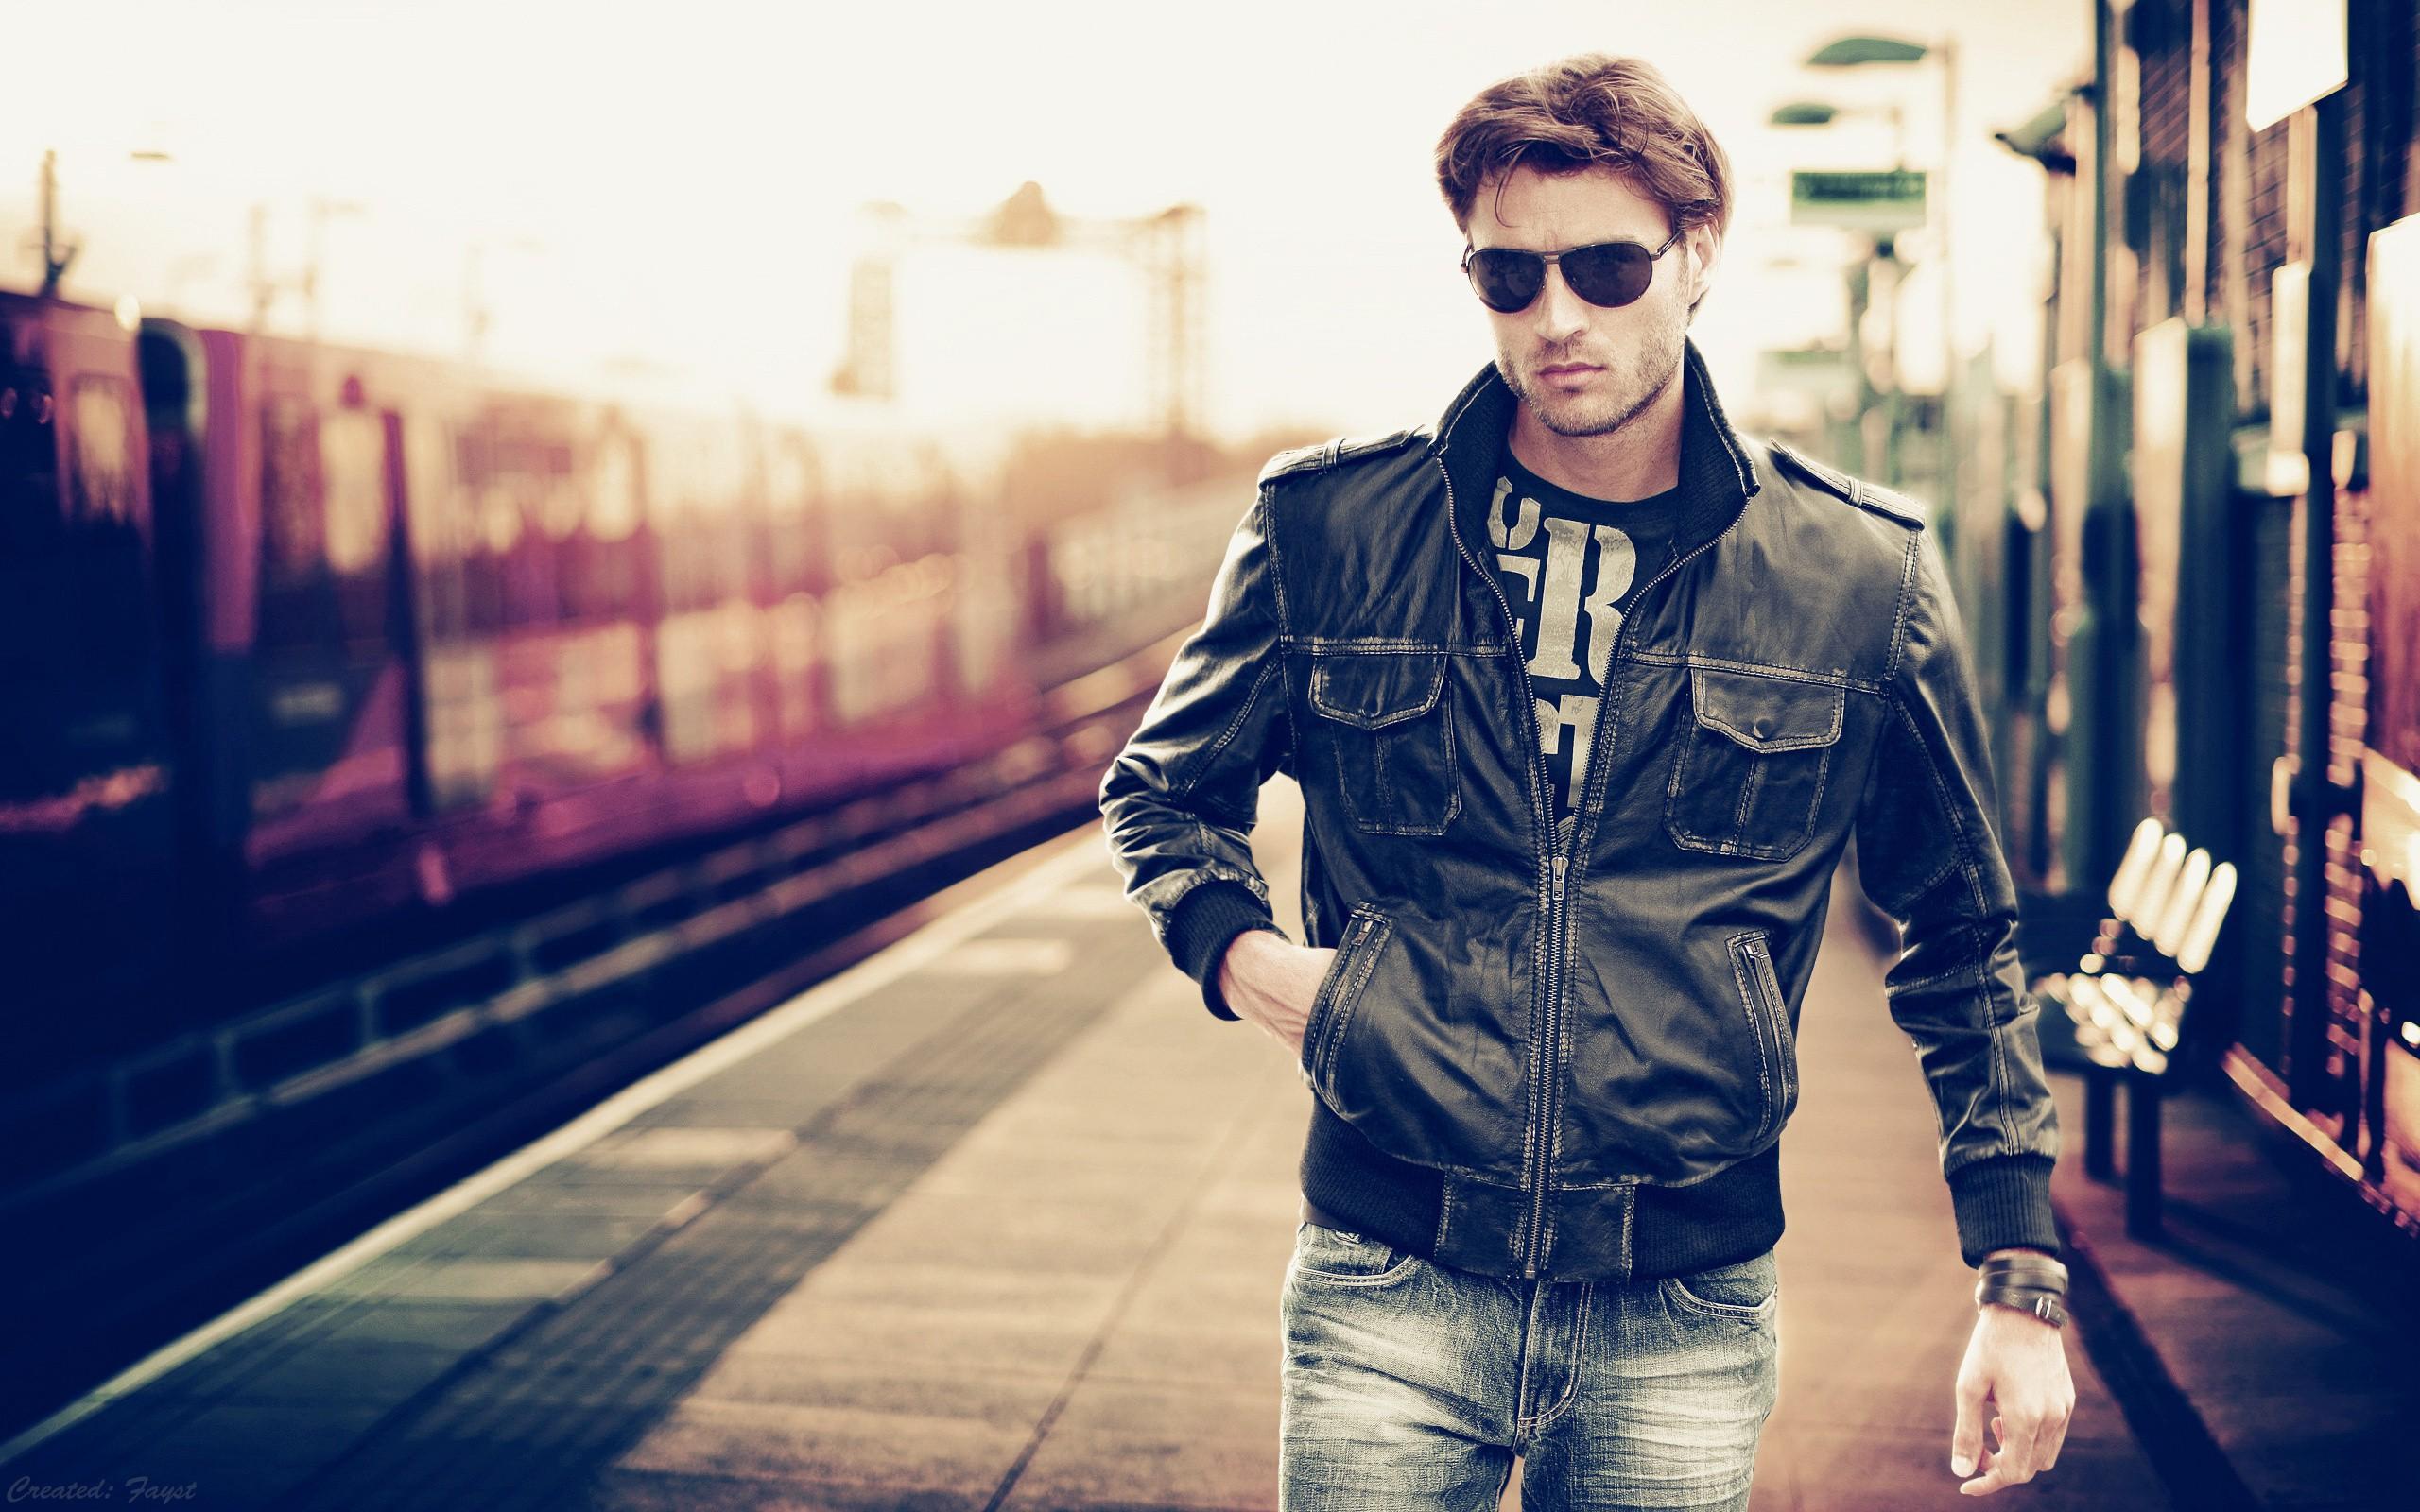 Models men sunglasses train stations bokeh leather jacket for Fashion style wallpaper